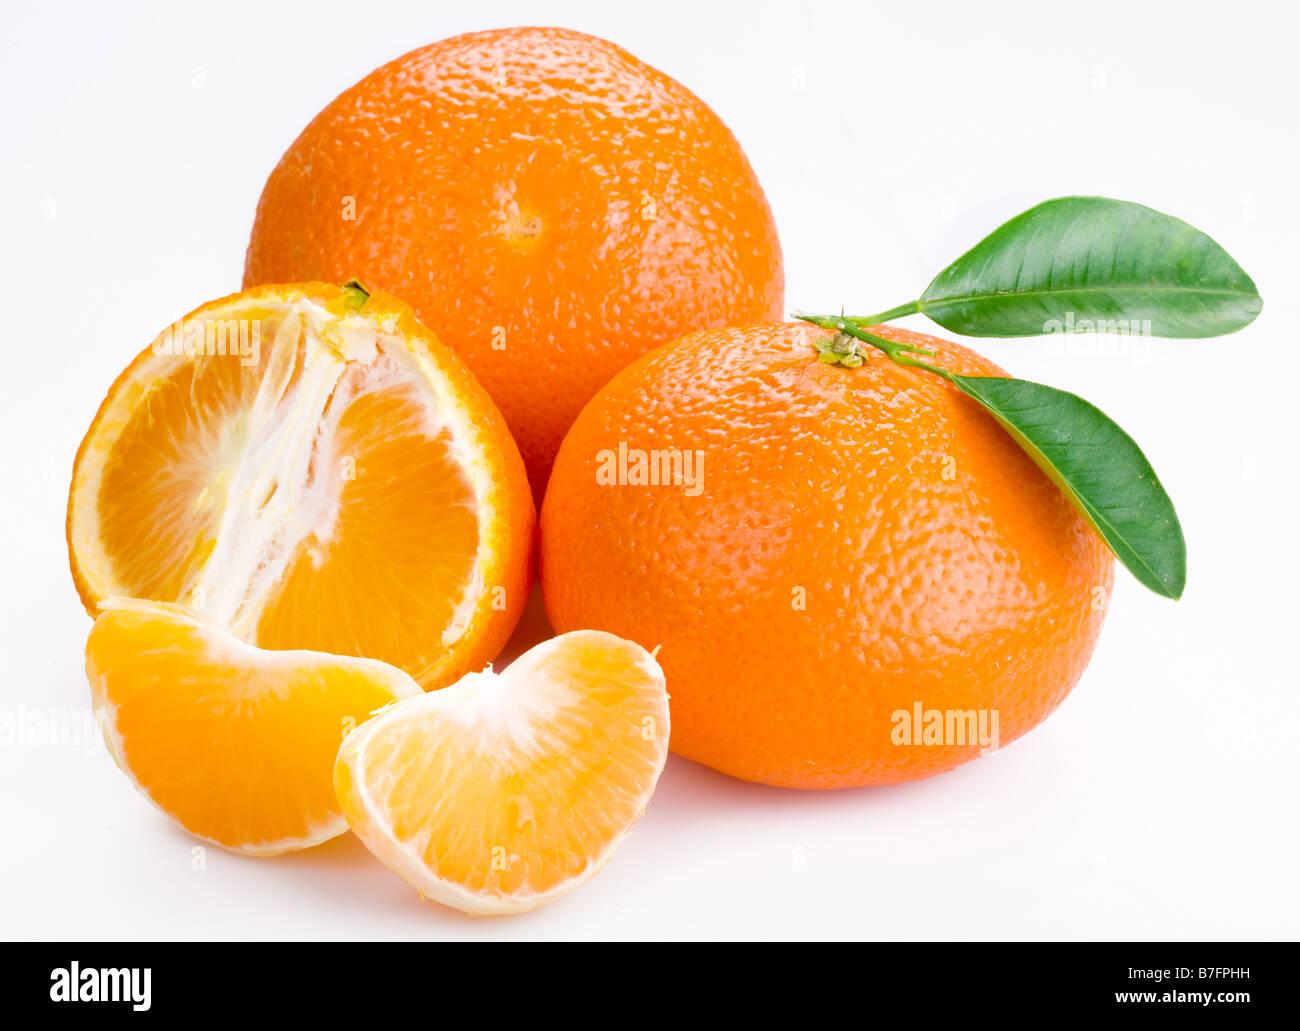 tangerine - Stock Image